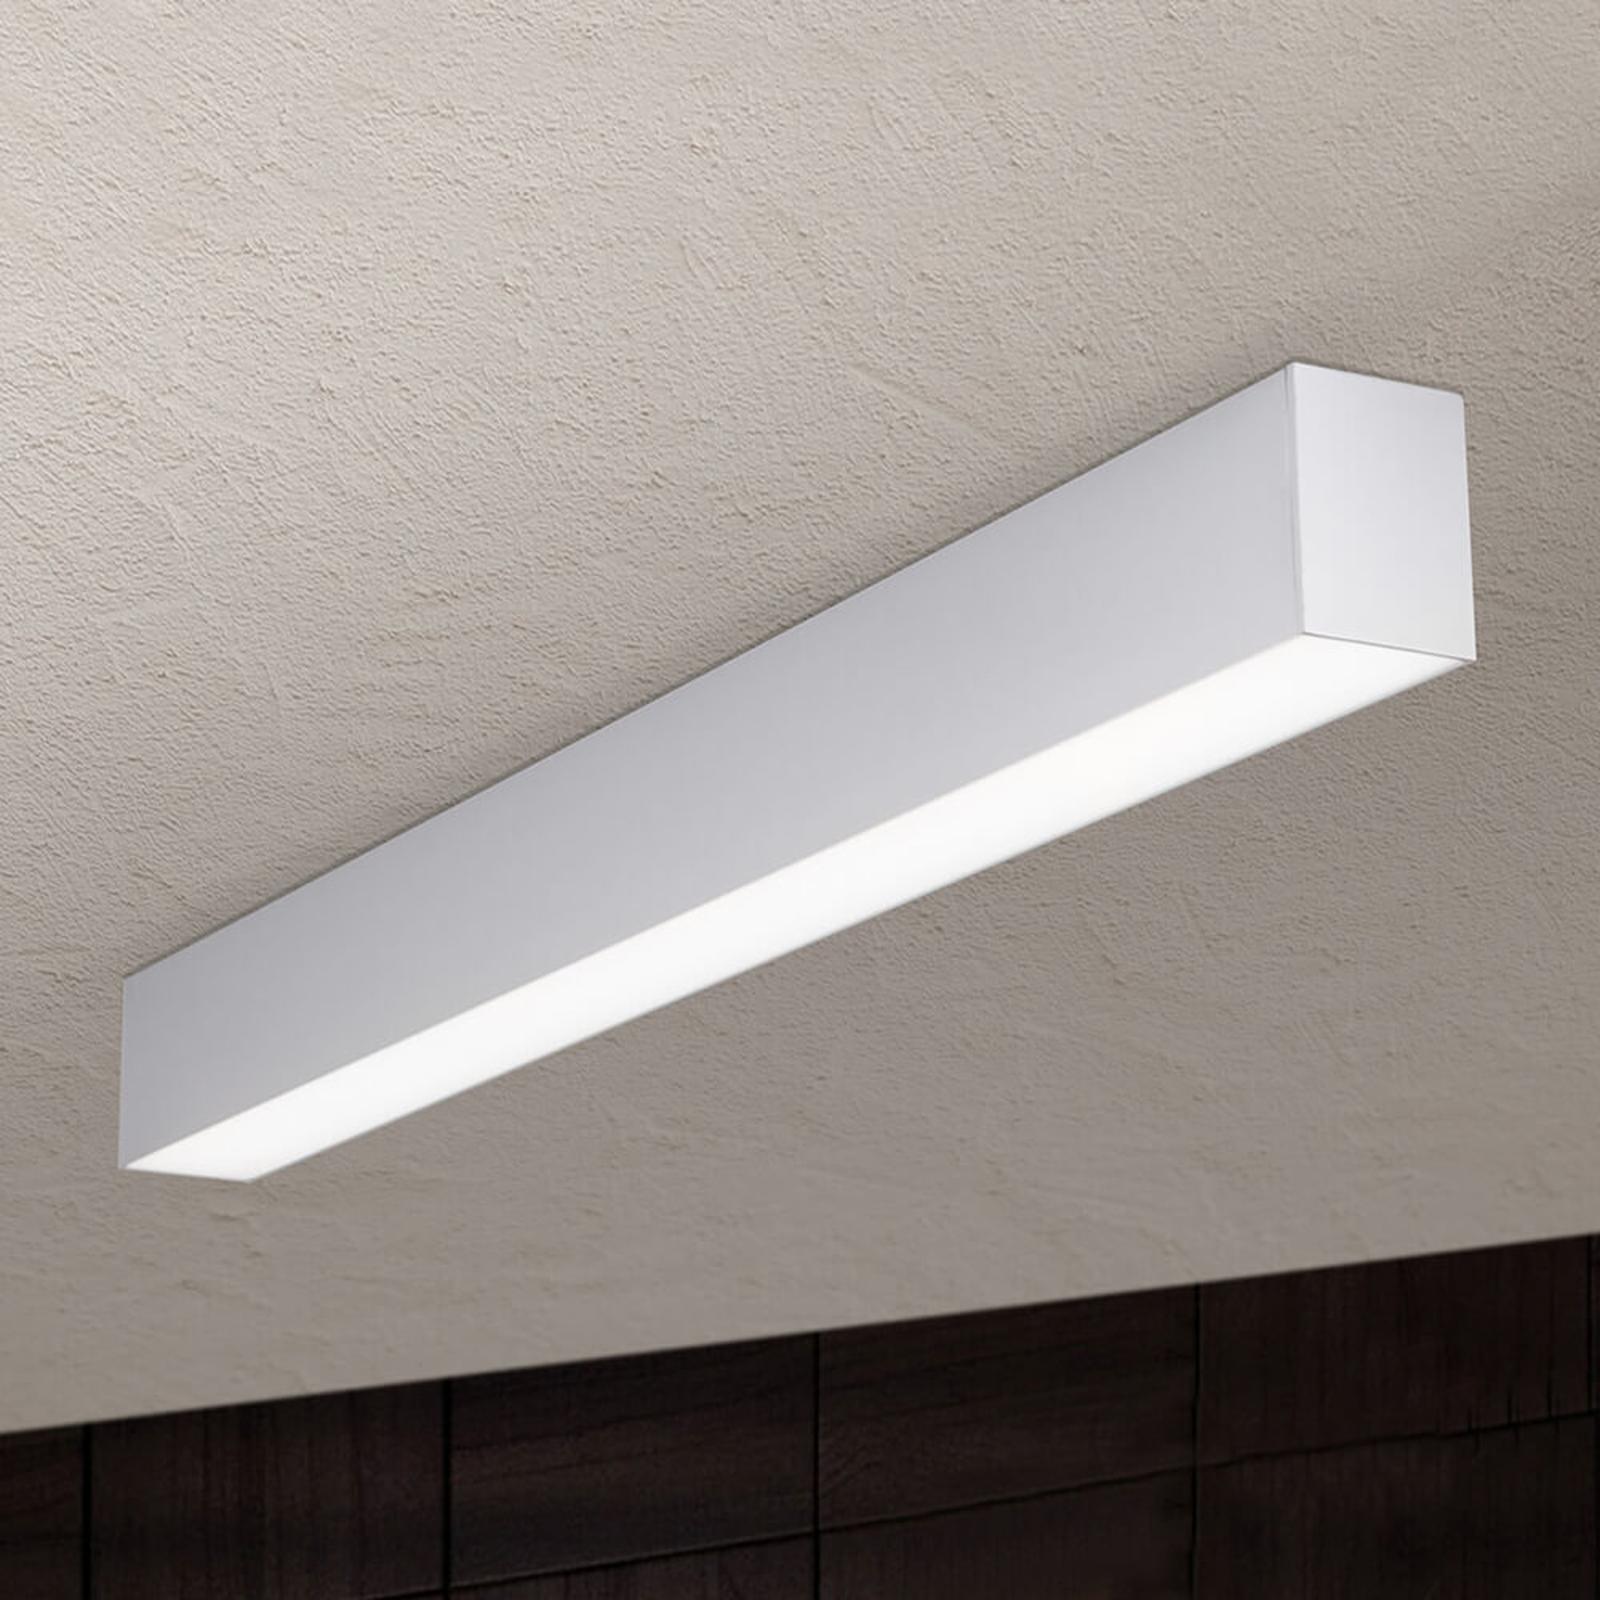 LED plafondlamp Sando met ophangset - 86 cm